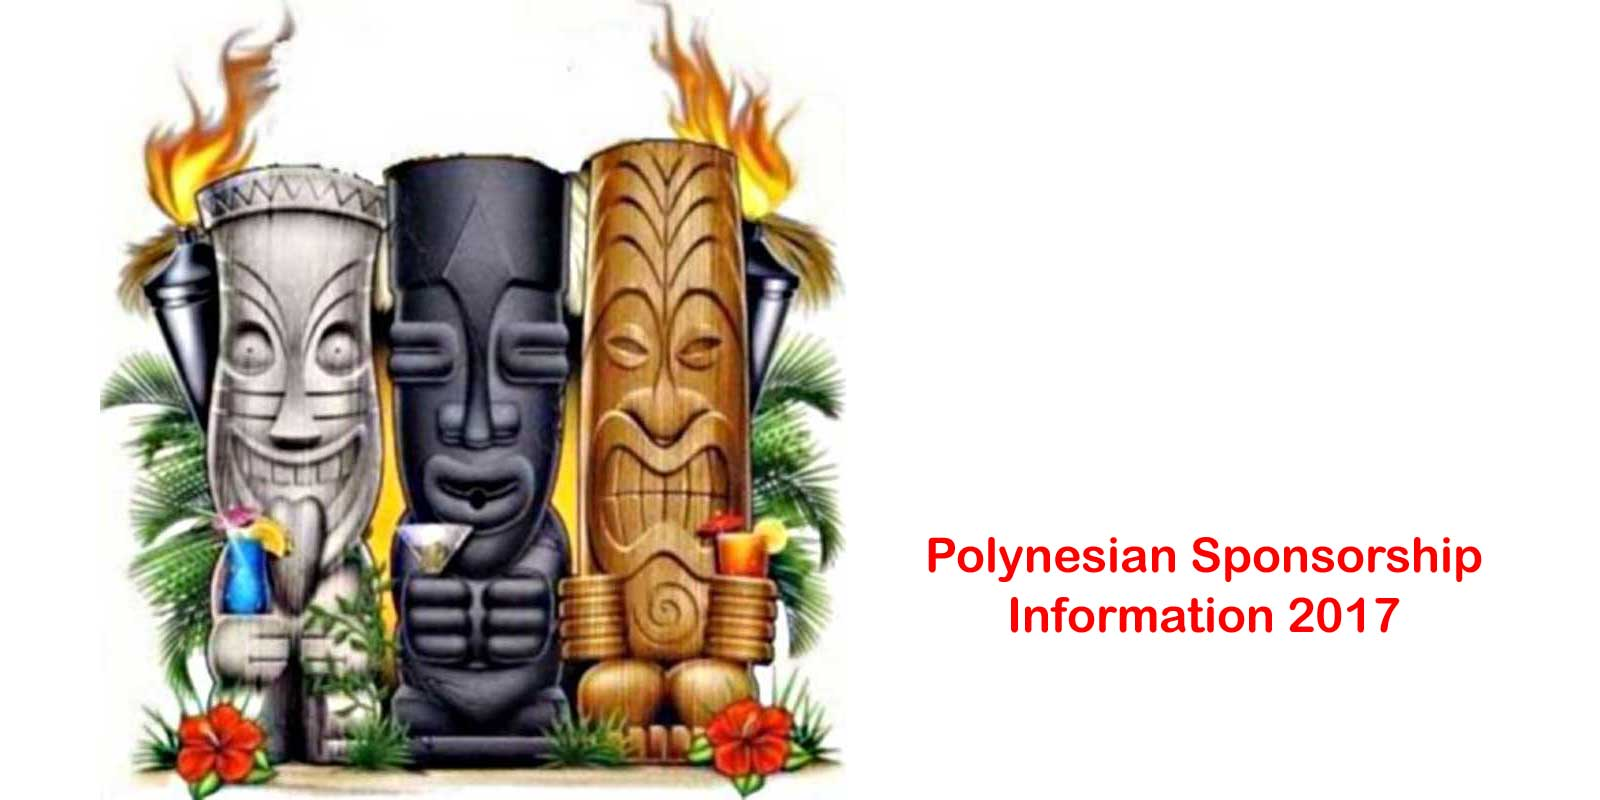 Polynesian Beach Party 2017 Sponsorship Form